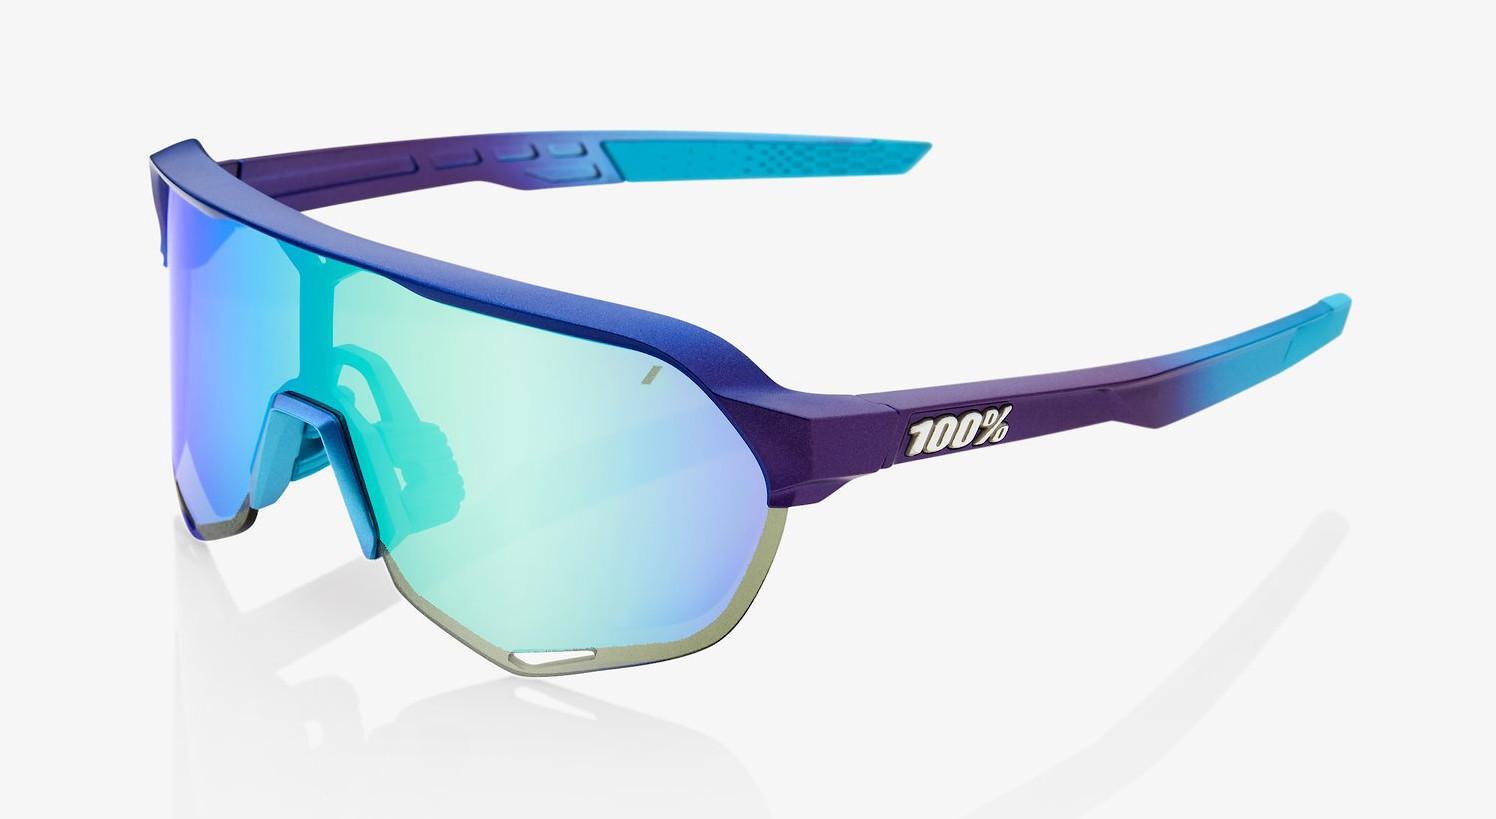 100% S2 - Matte Metallic Into the Fade Blue, Topaz Multilayer Mirror Lens